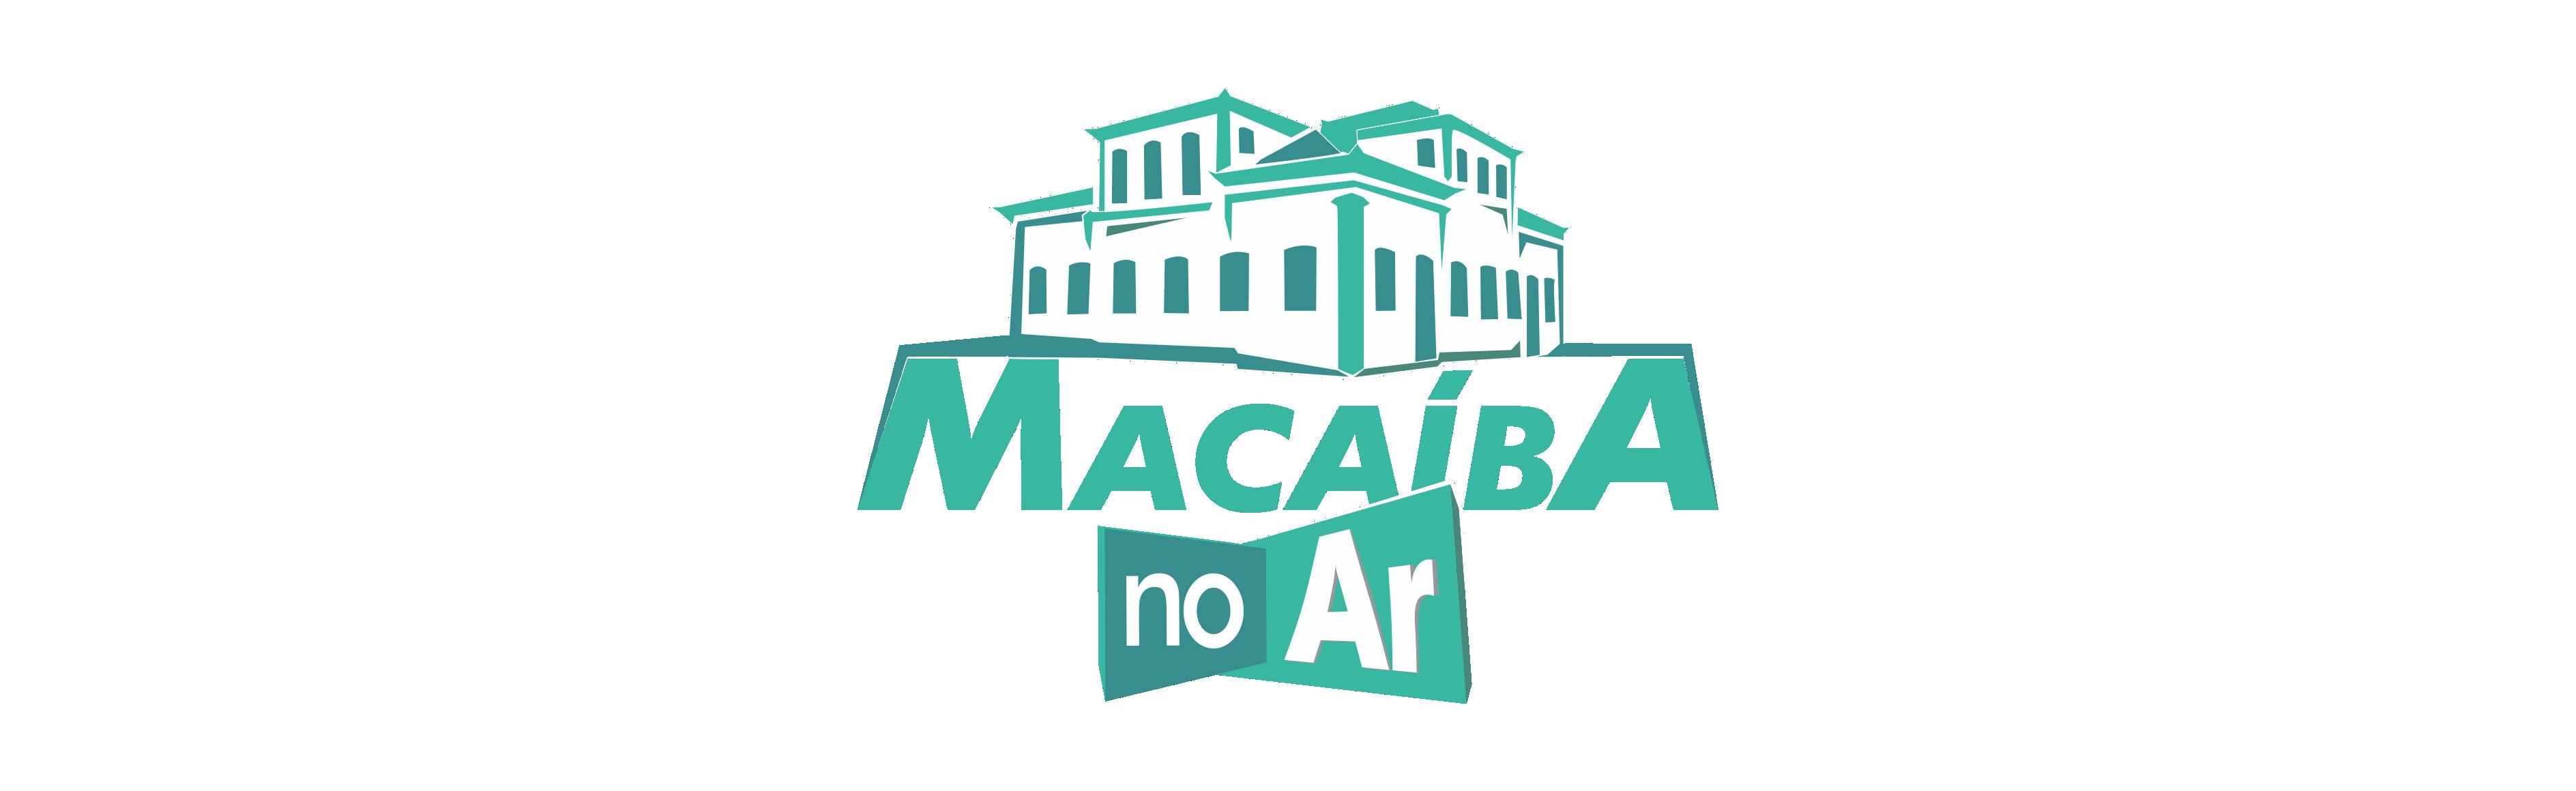 Macaíba no Ar